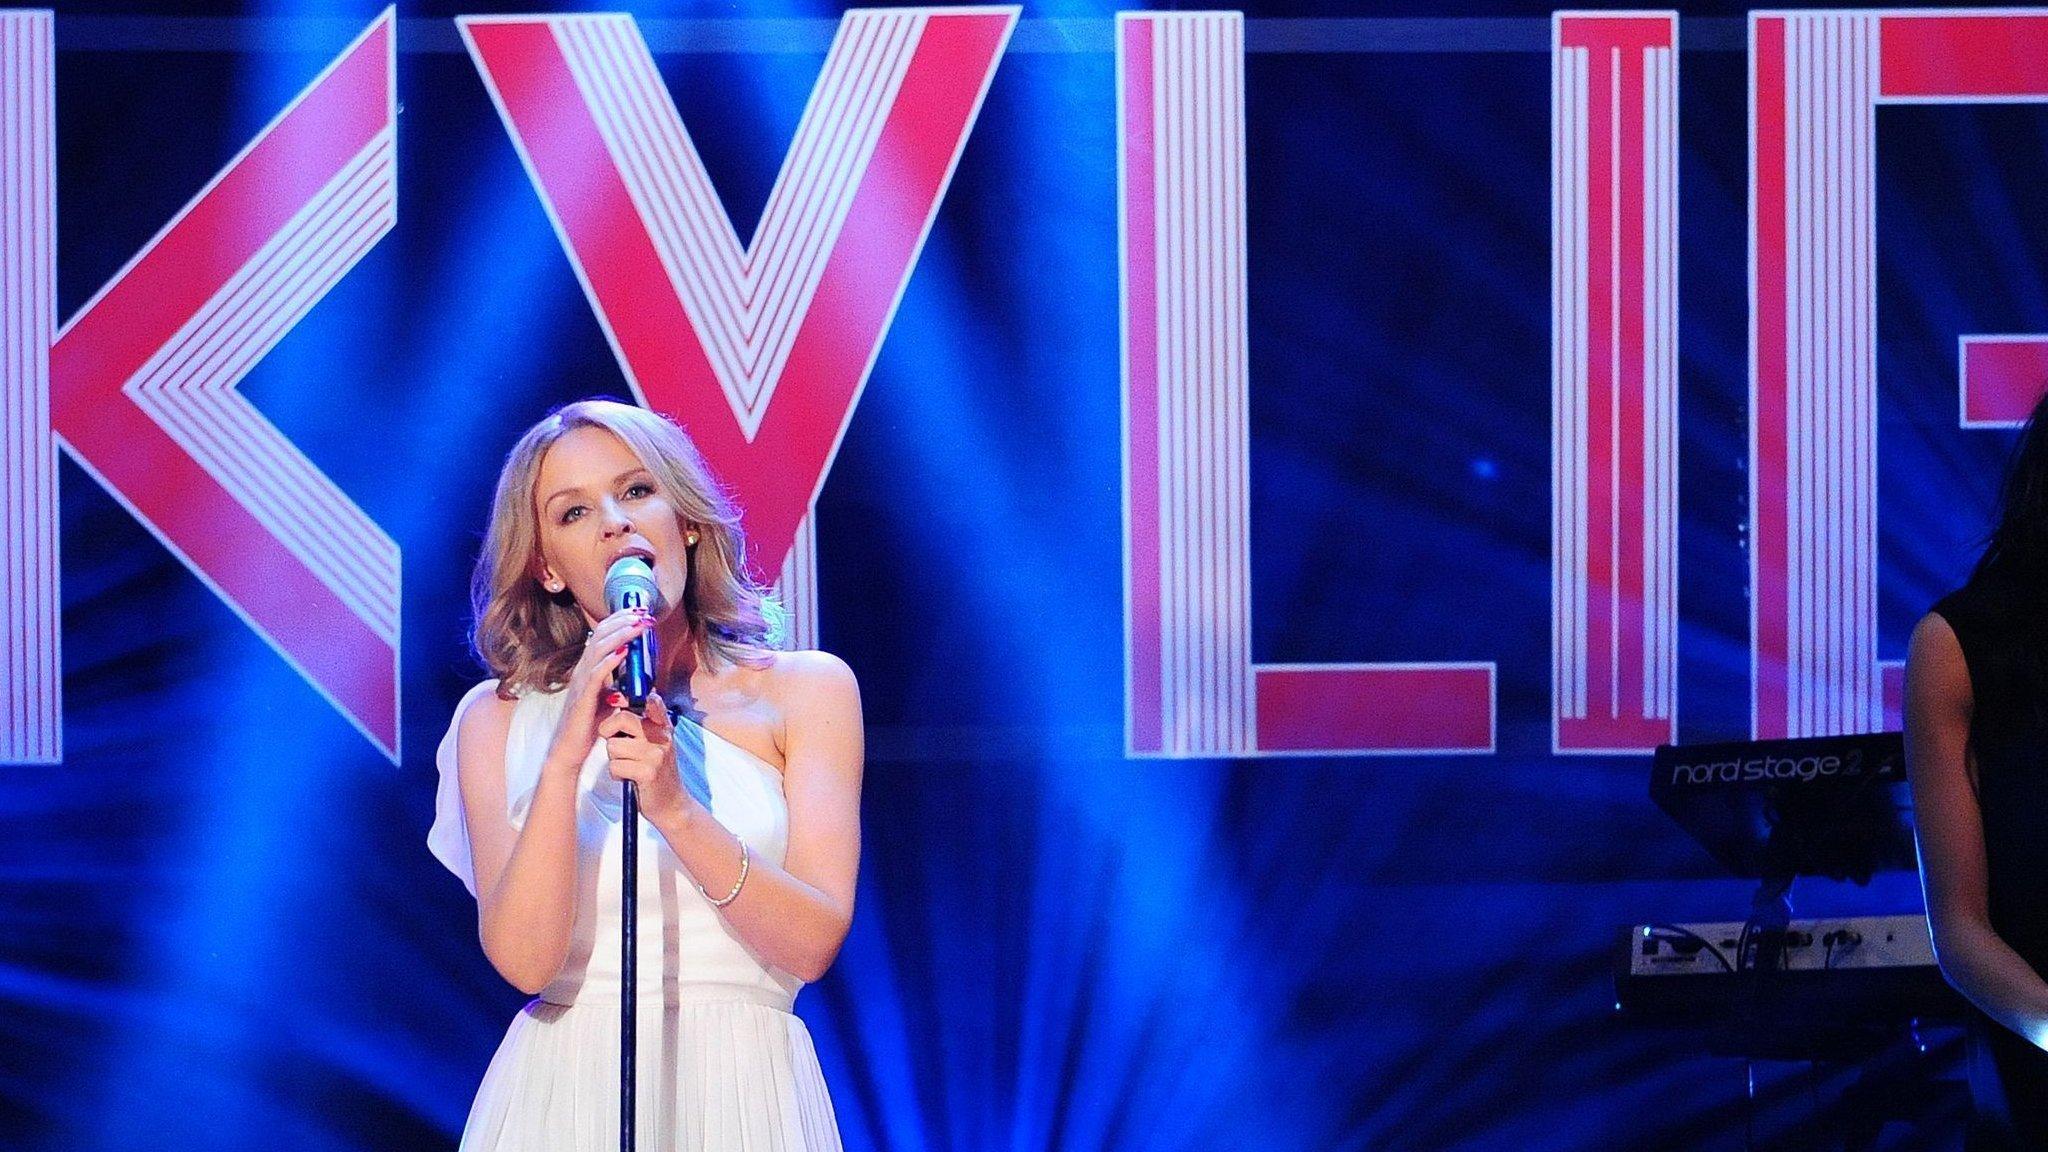 Kylie to headline Radio 2 in Hyde Park